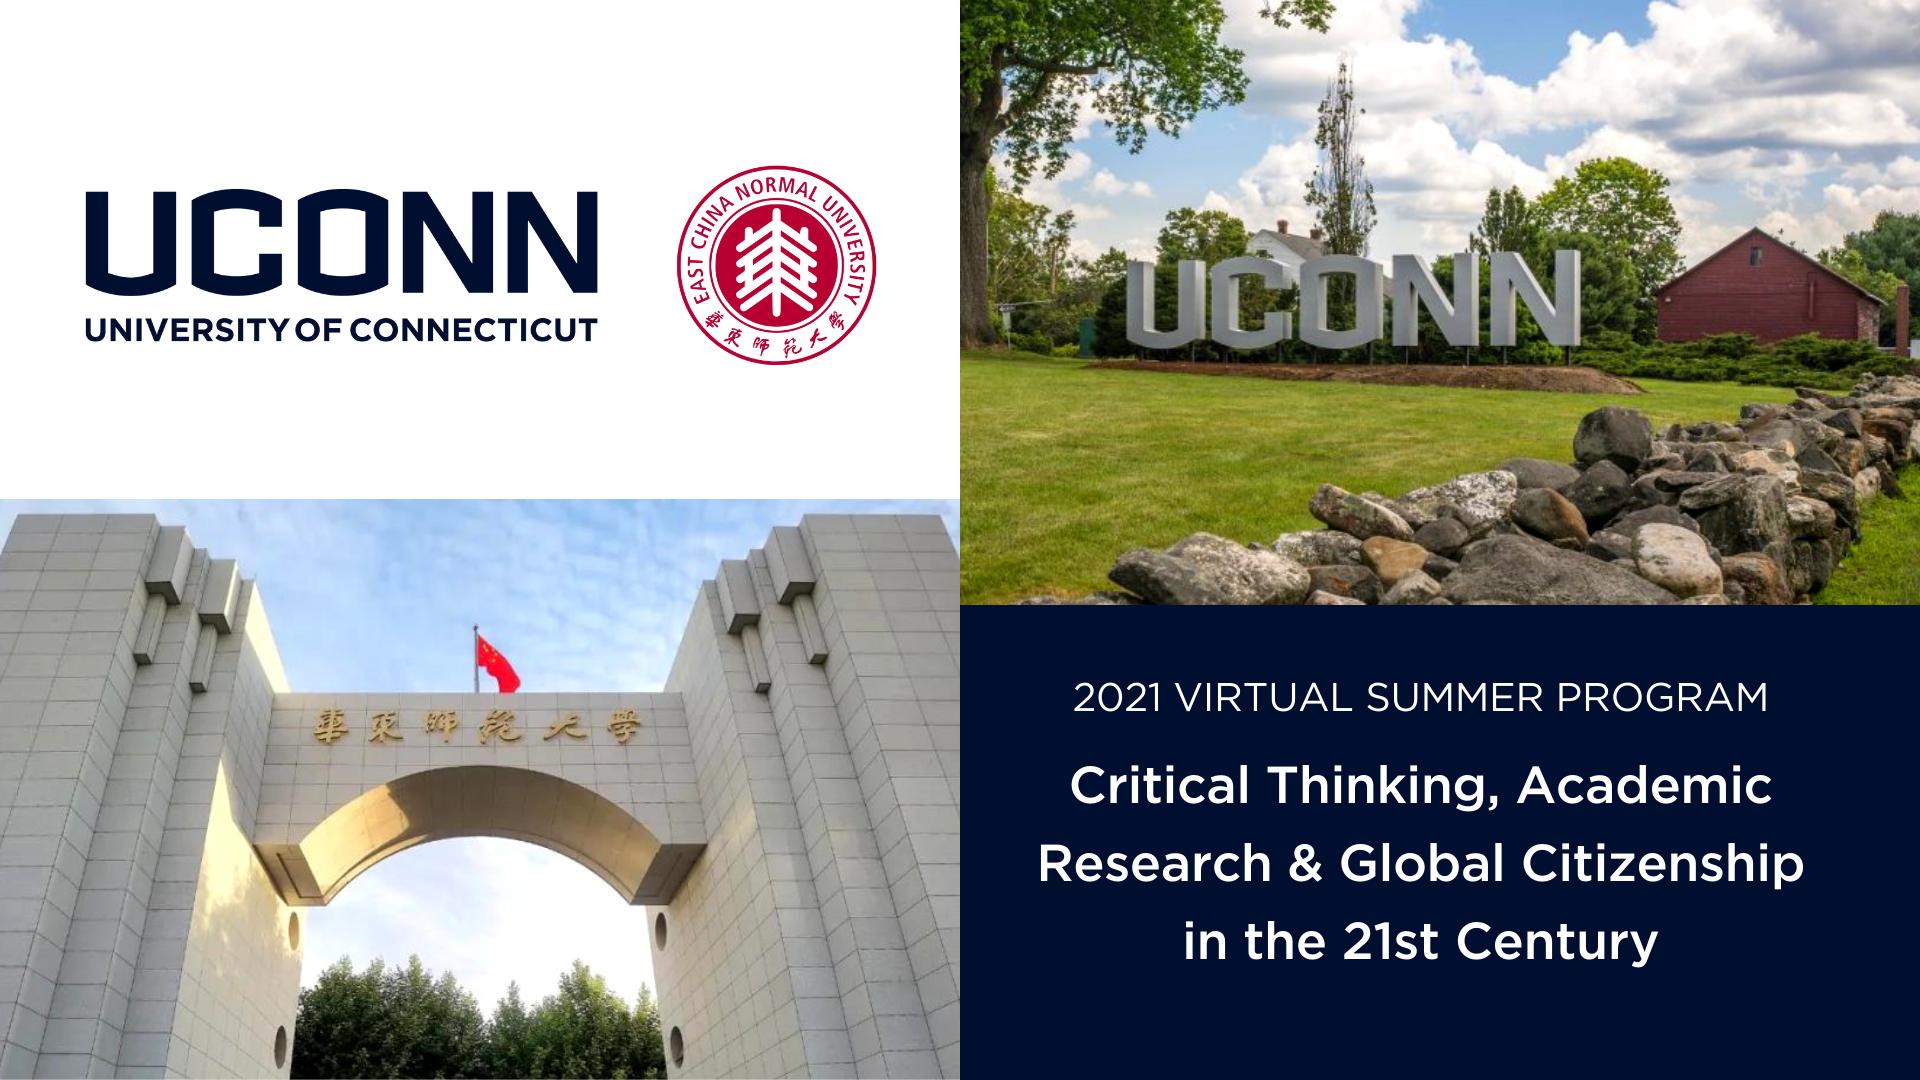 UConn ECNU Virtual Program Welcome